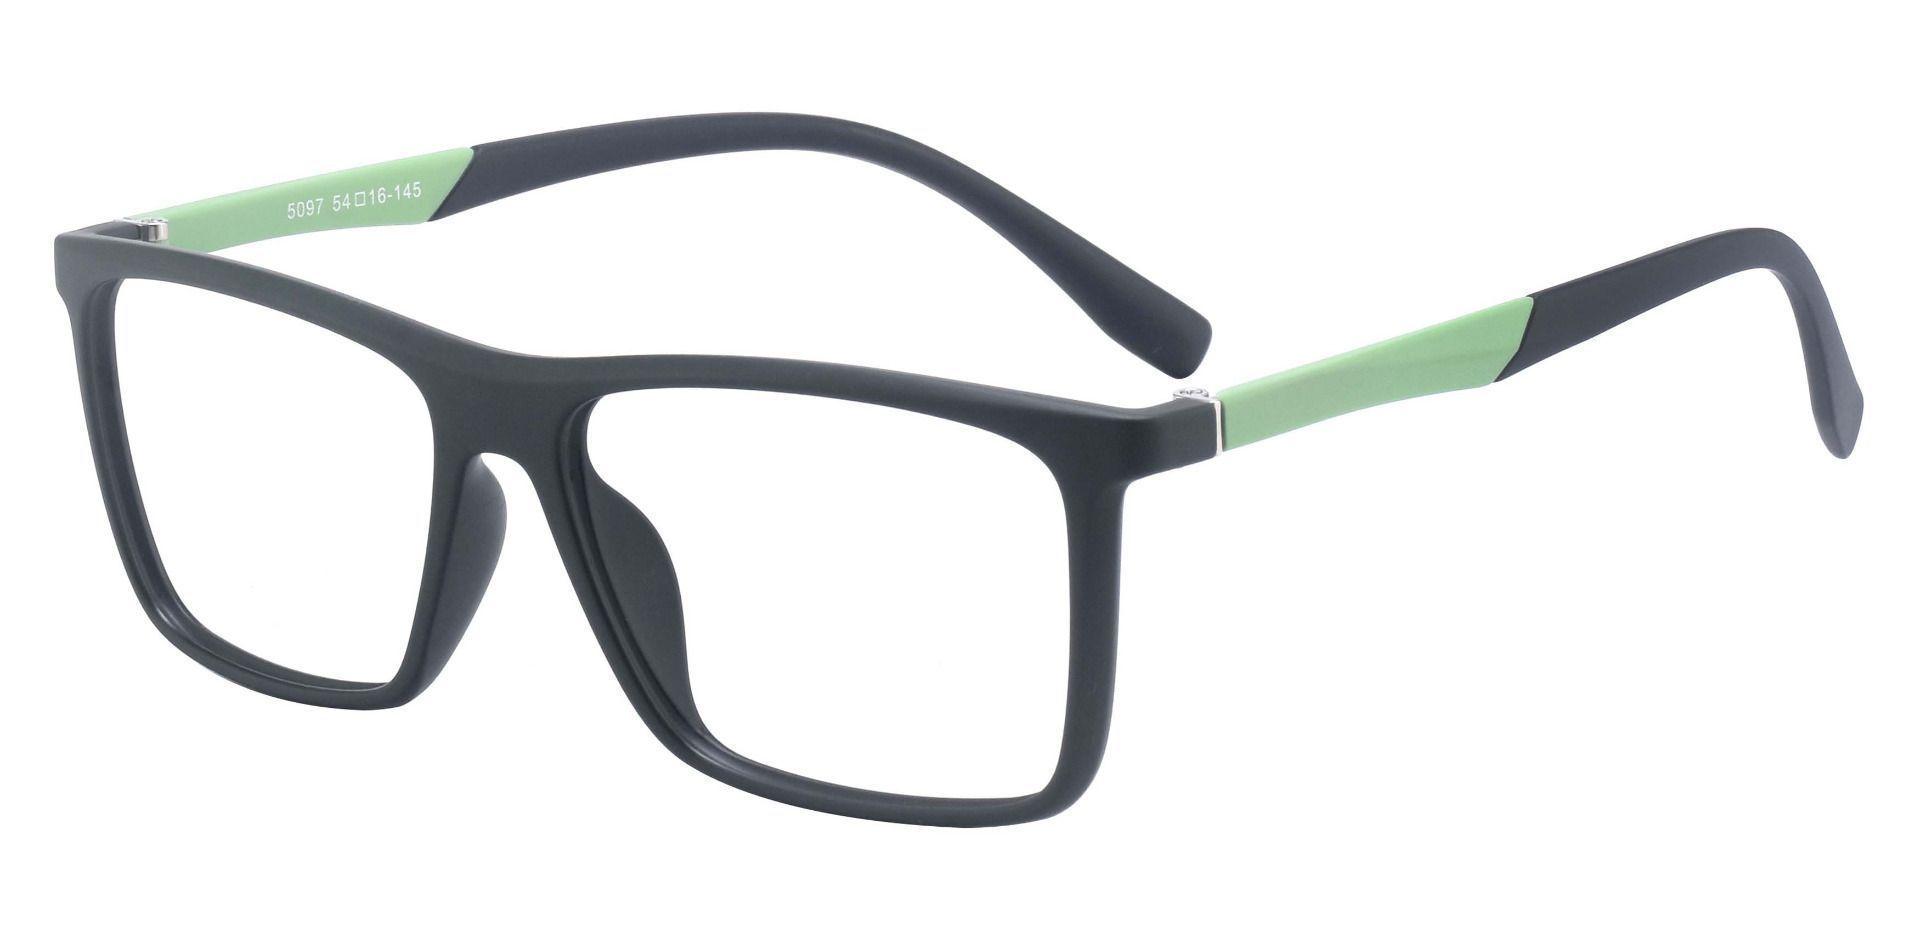 Cleveland Rectangle Prescription Glasses - Green